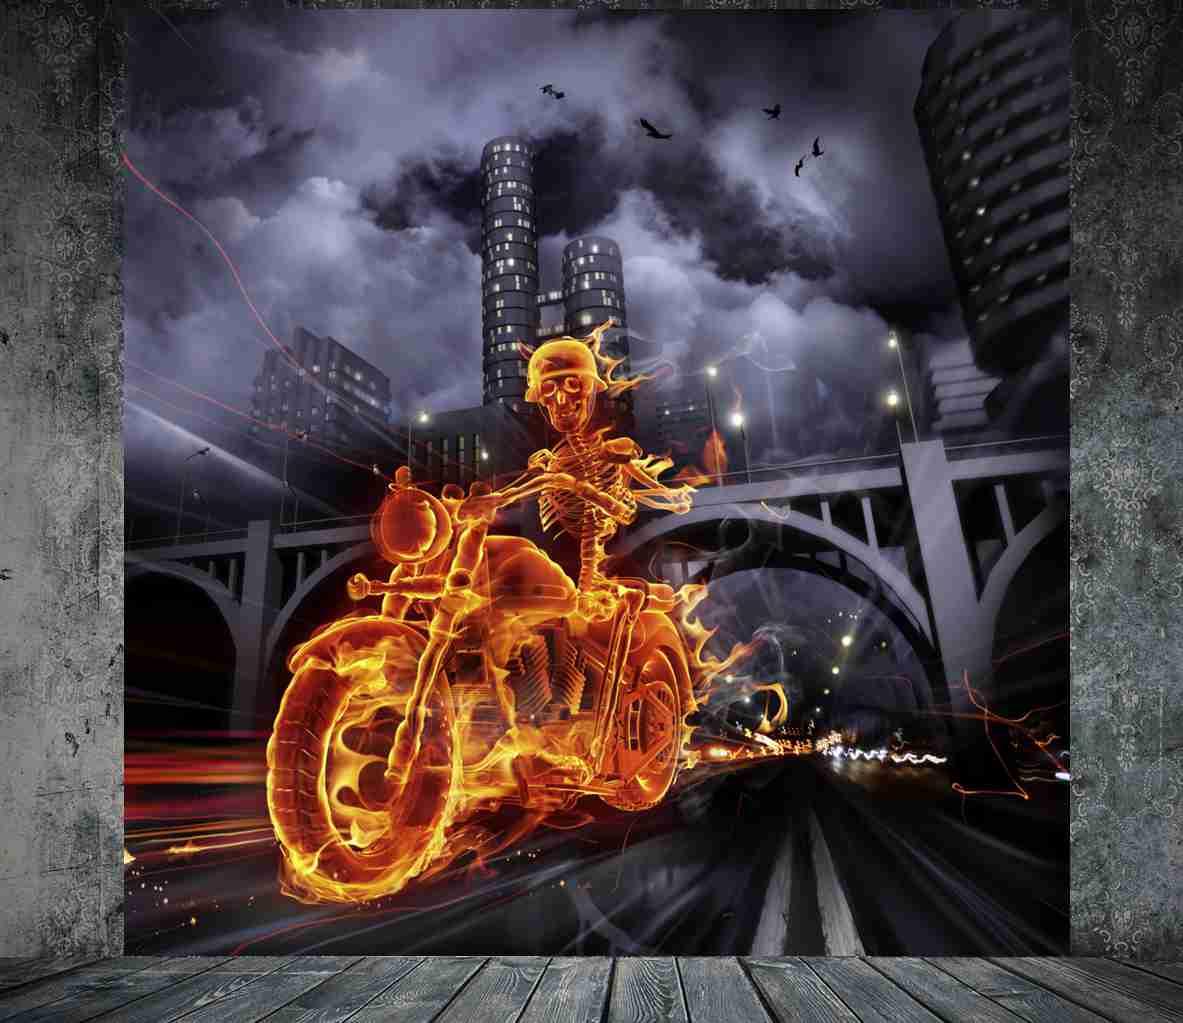 poster fototapete selbstklebend burn brennendes skelett motorrad ebay. Black Bedroom Furniture Sets. Home Design Ideas